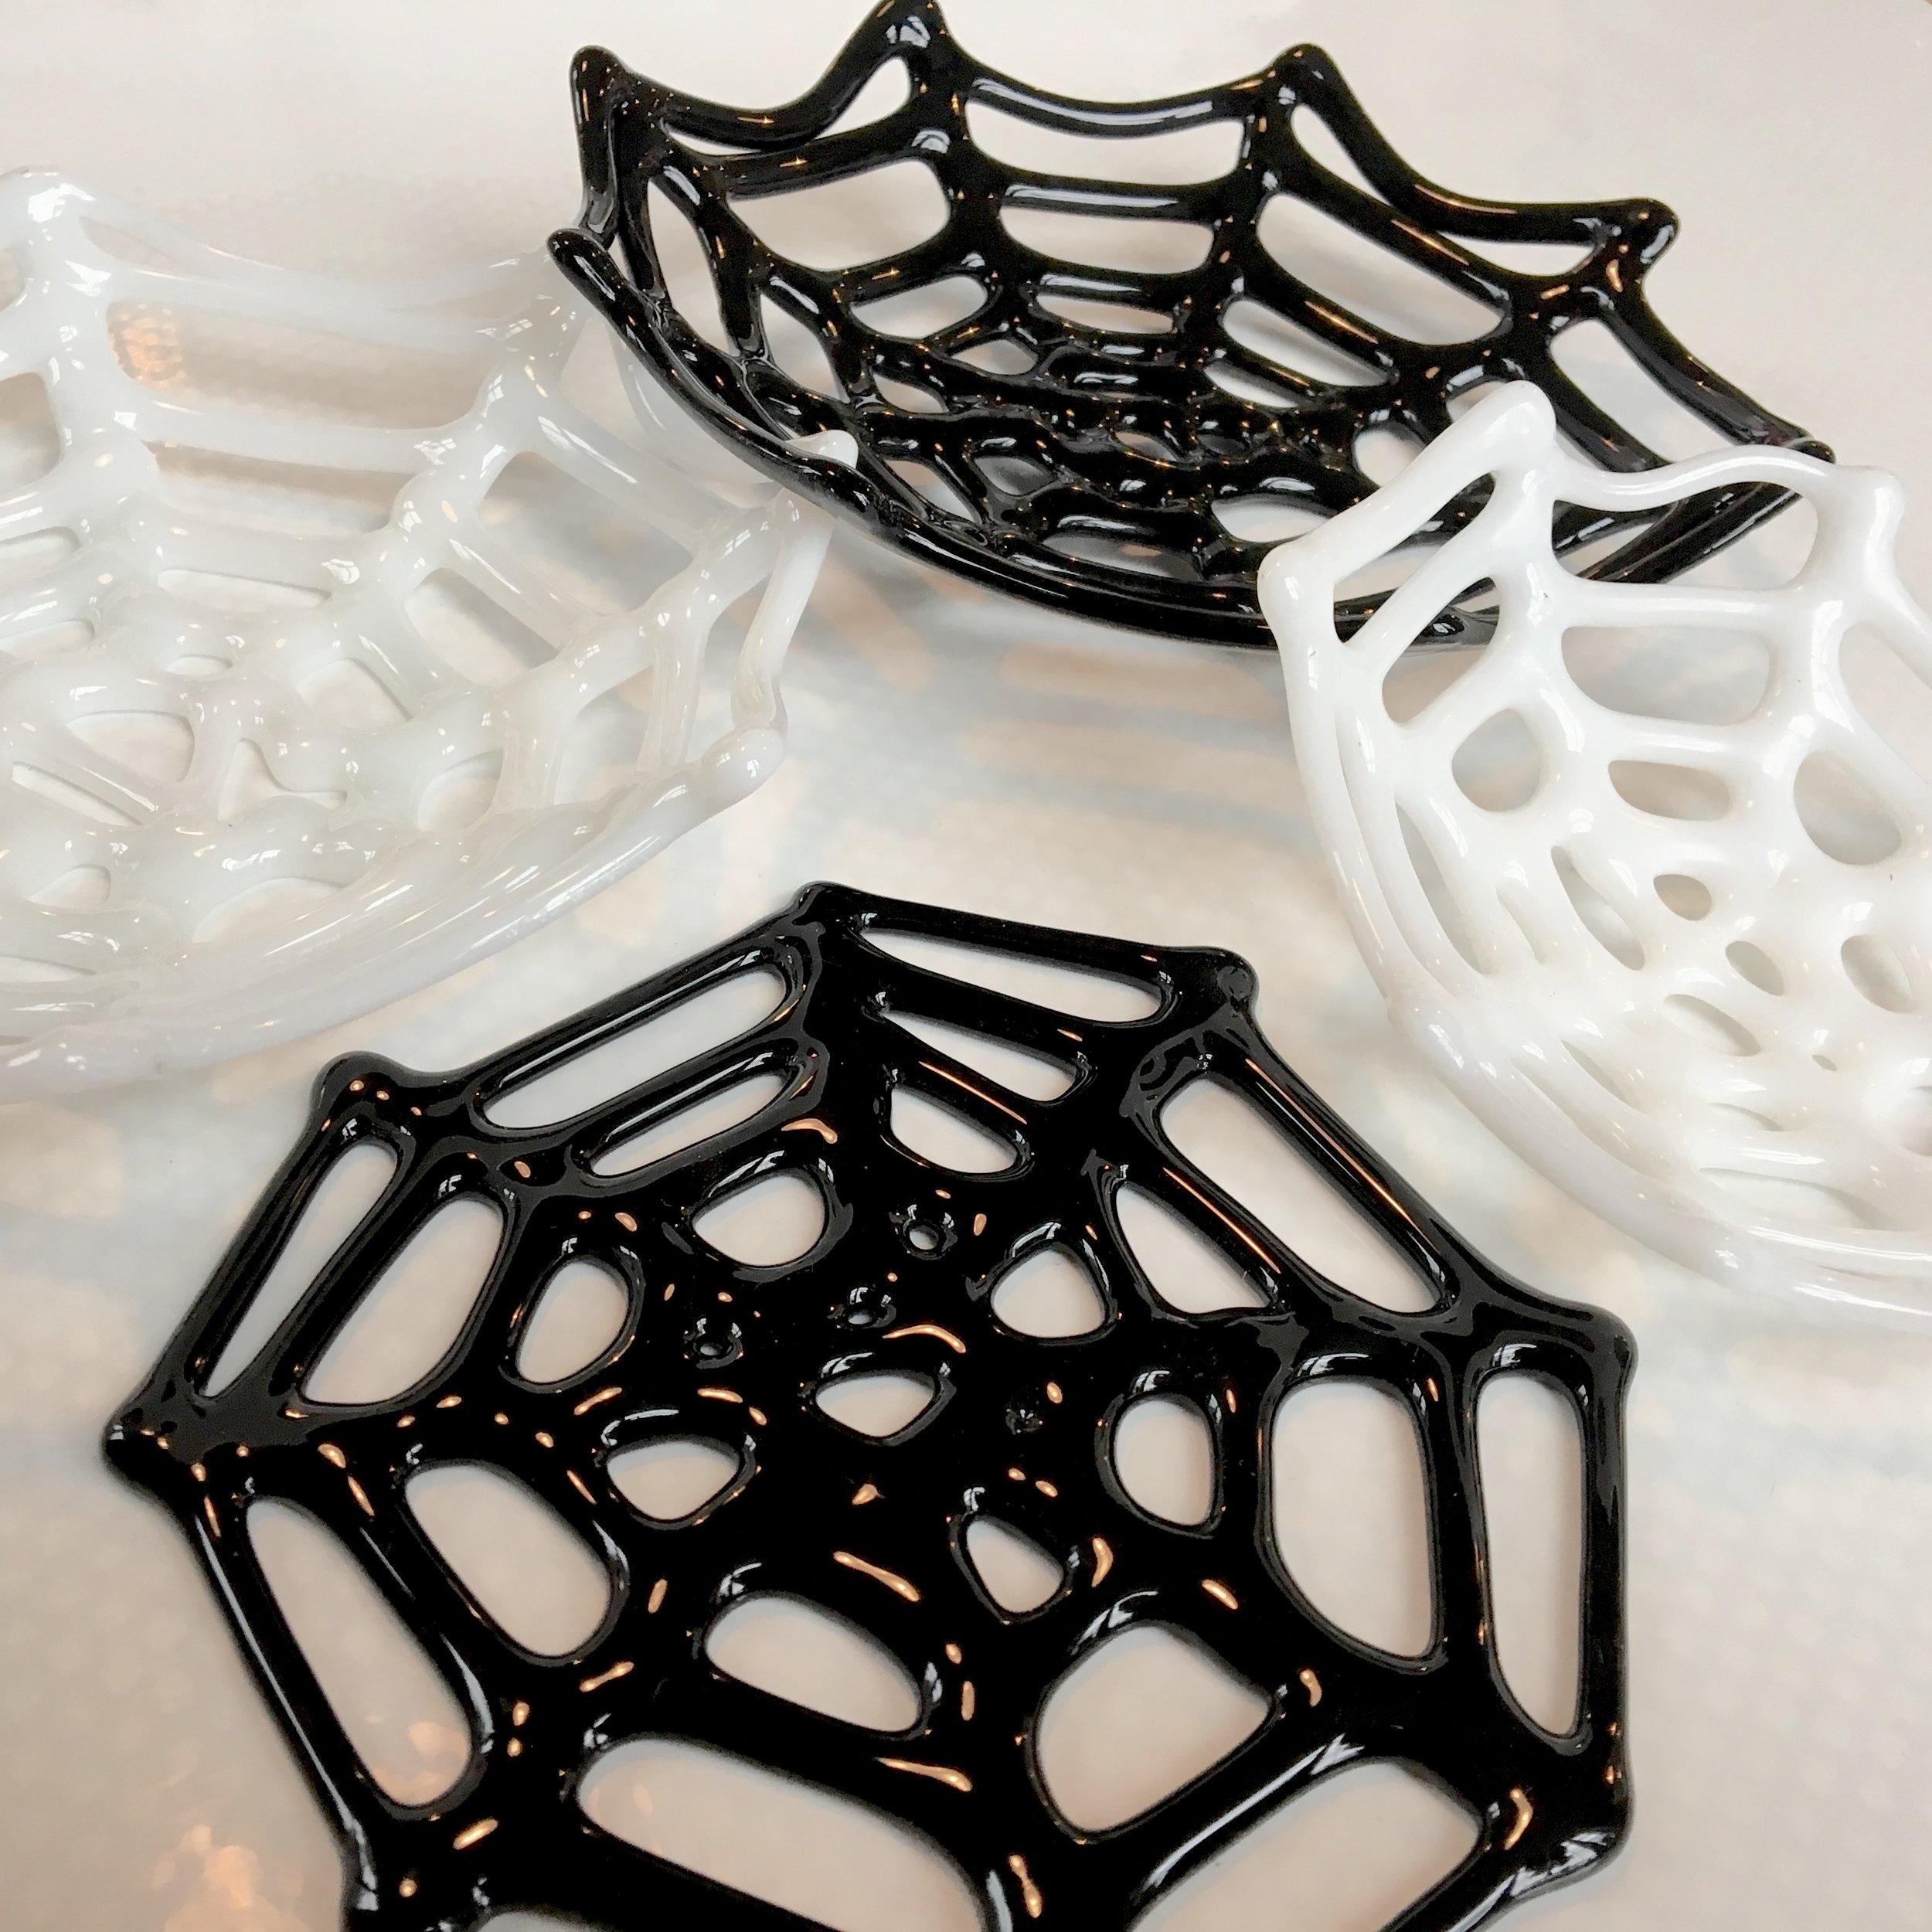 Spider Webs 1.jpeg